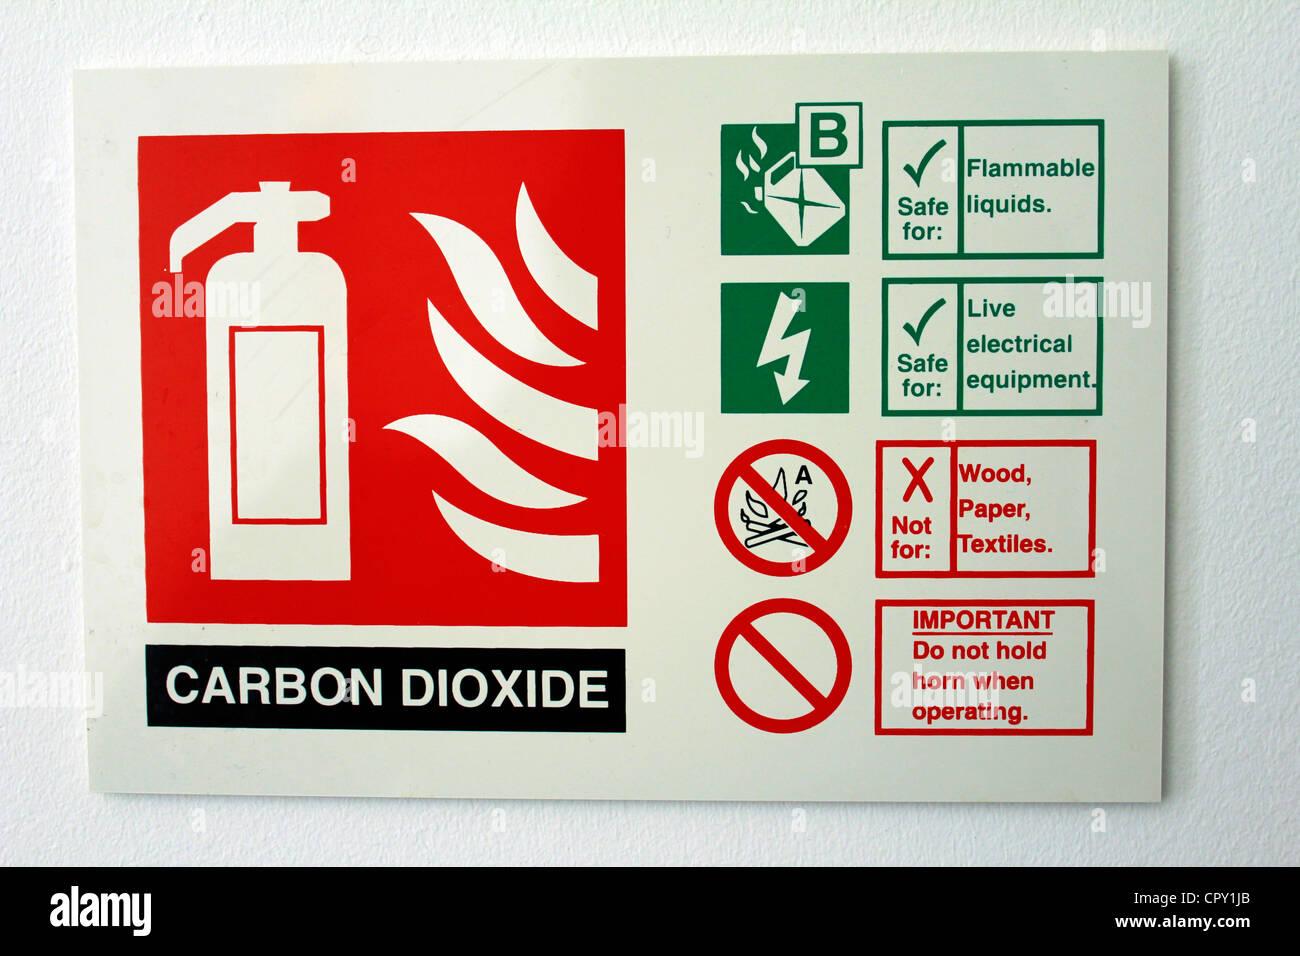 Una etiqueta de un extintor de incendios de dióxido de carbono Imagen De Stock